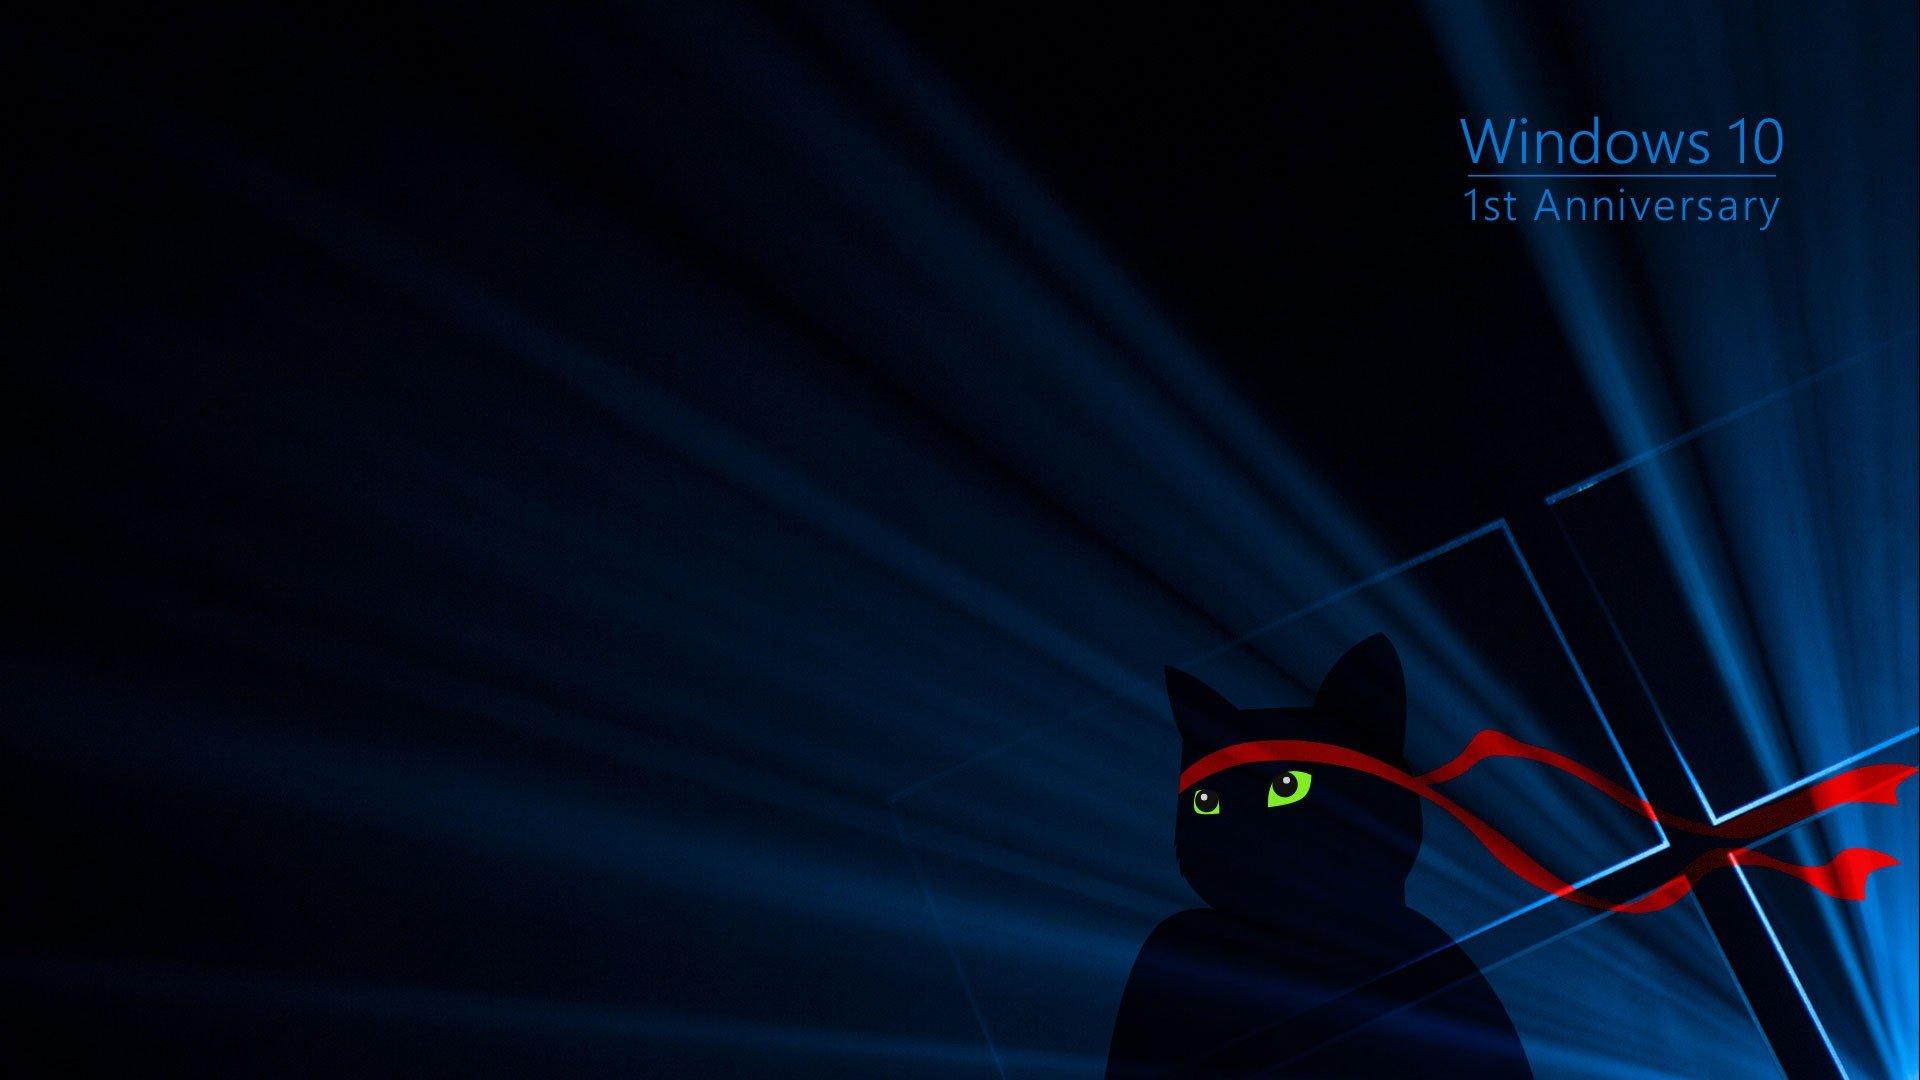 Wallpaper 1920x1080 Px Black Blue Cat Dark Green Red